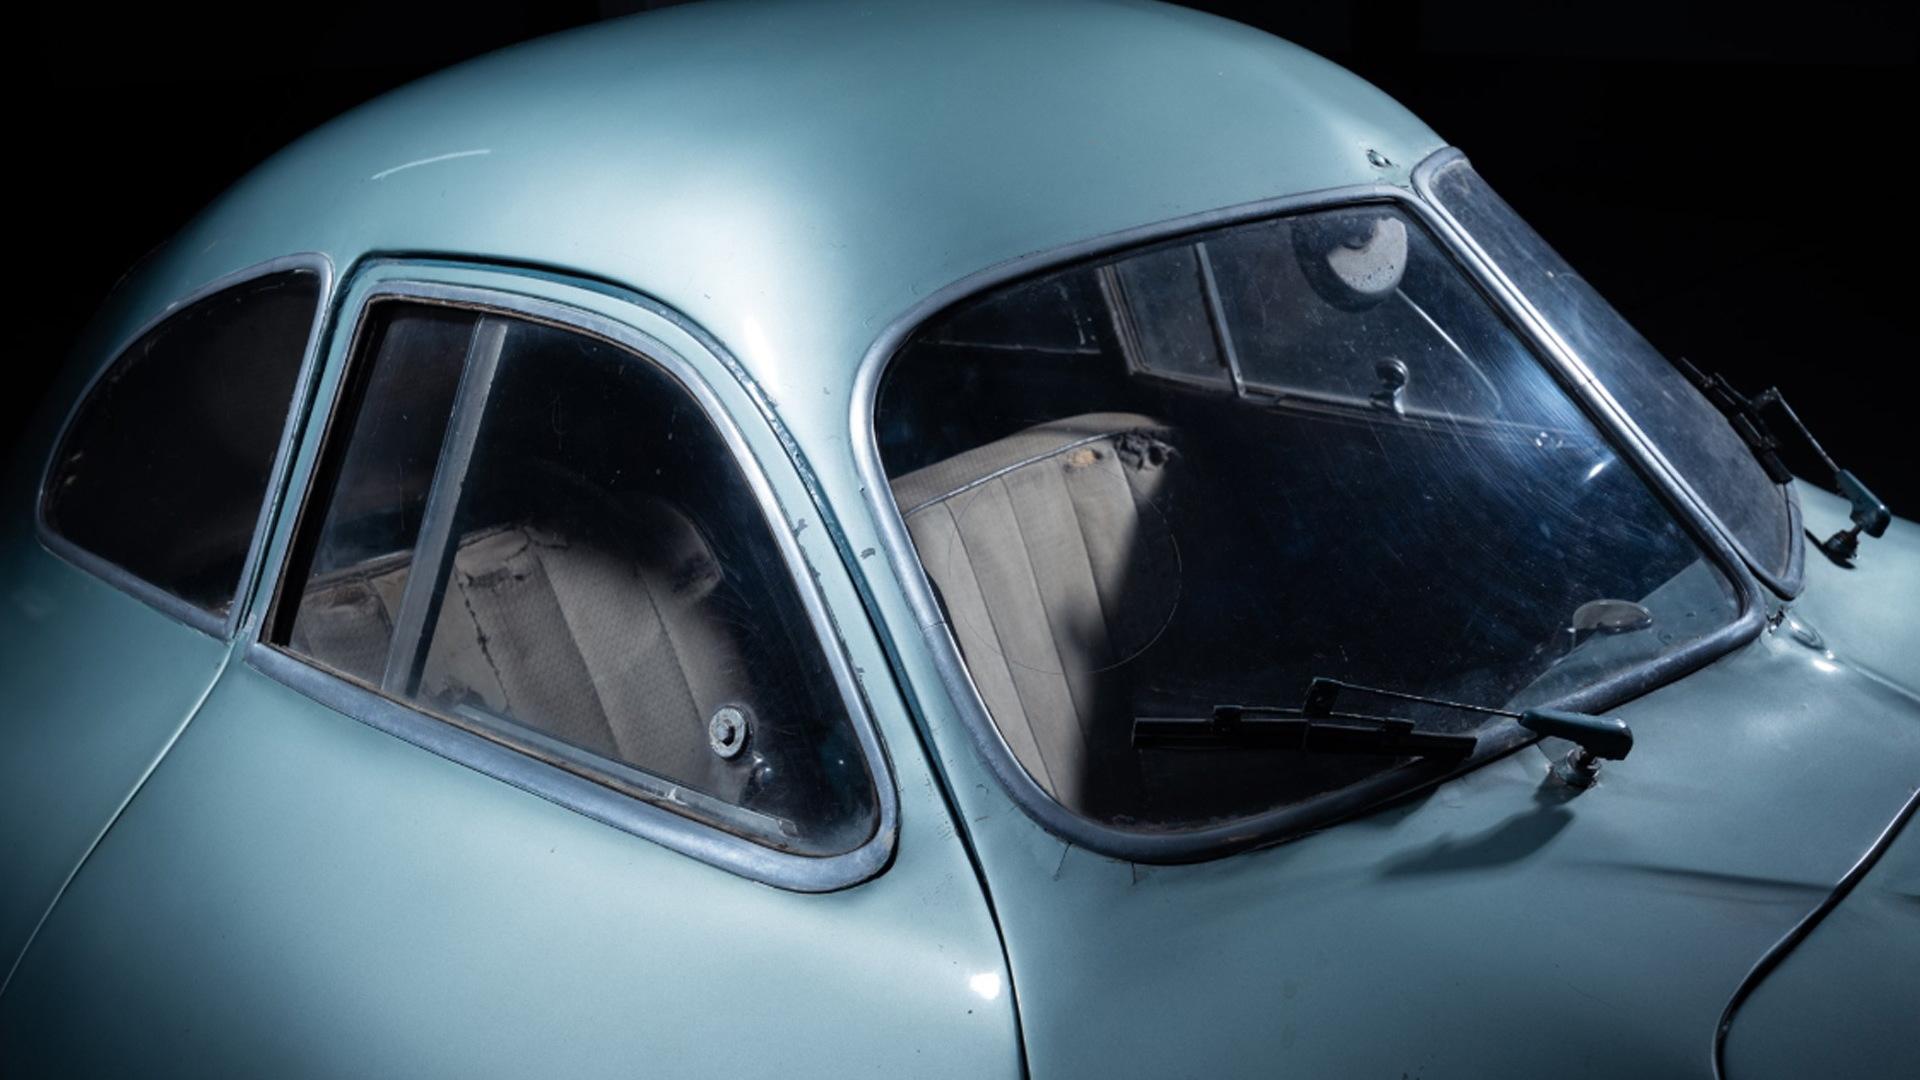 Legendary Porsche-Designed Type 64 Up For Auction